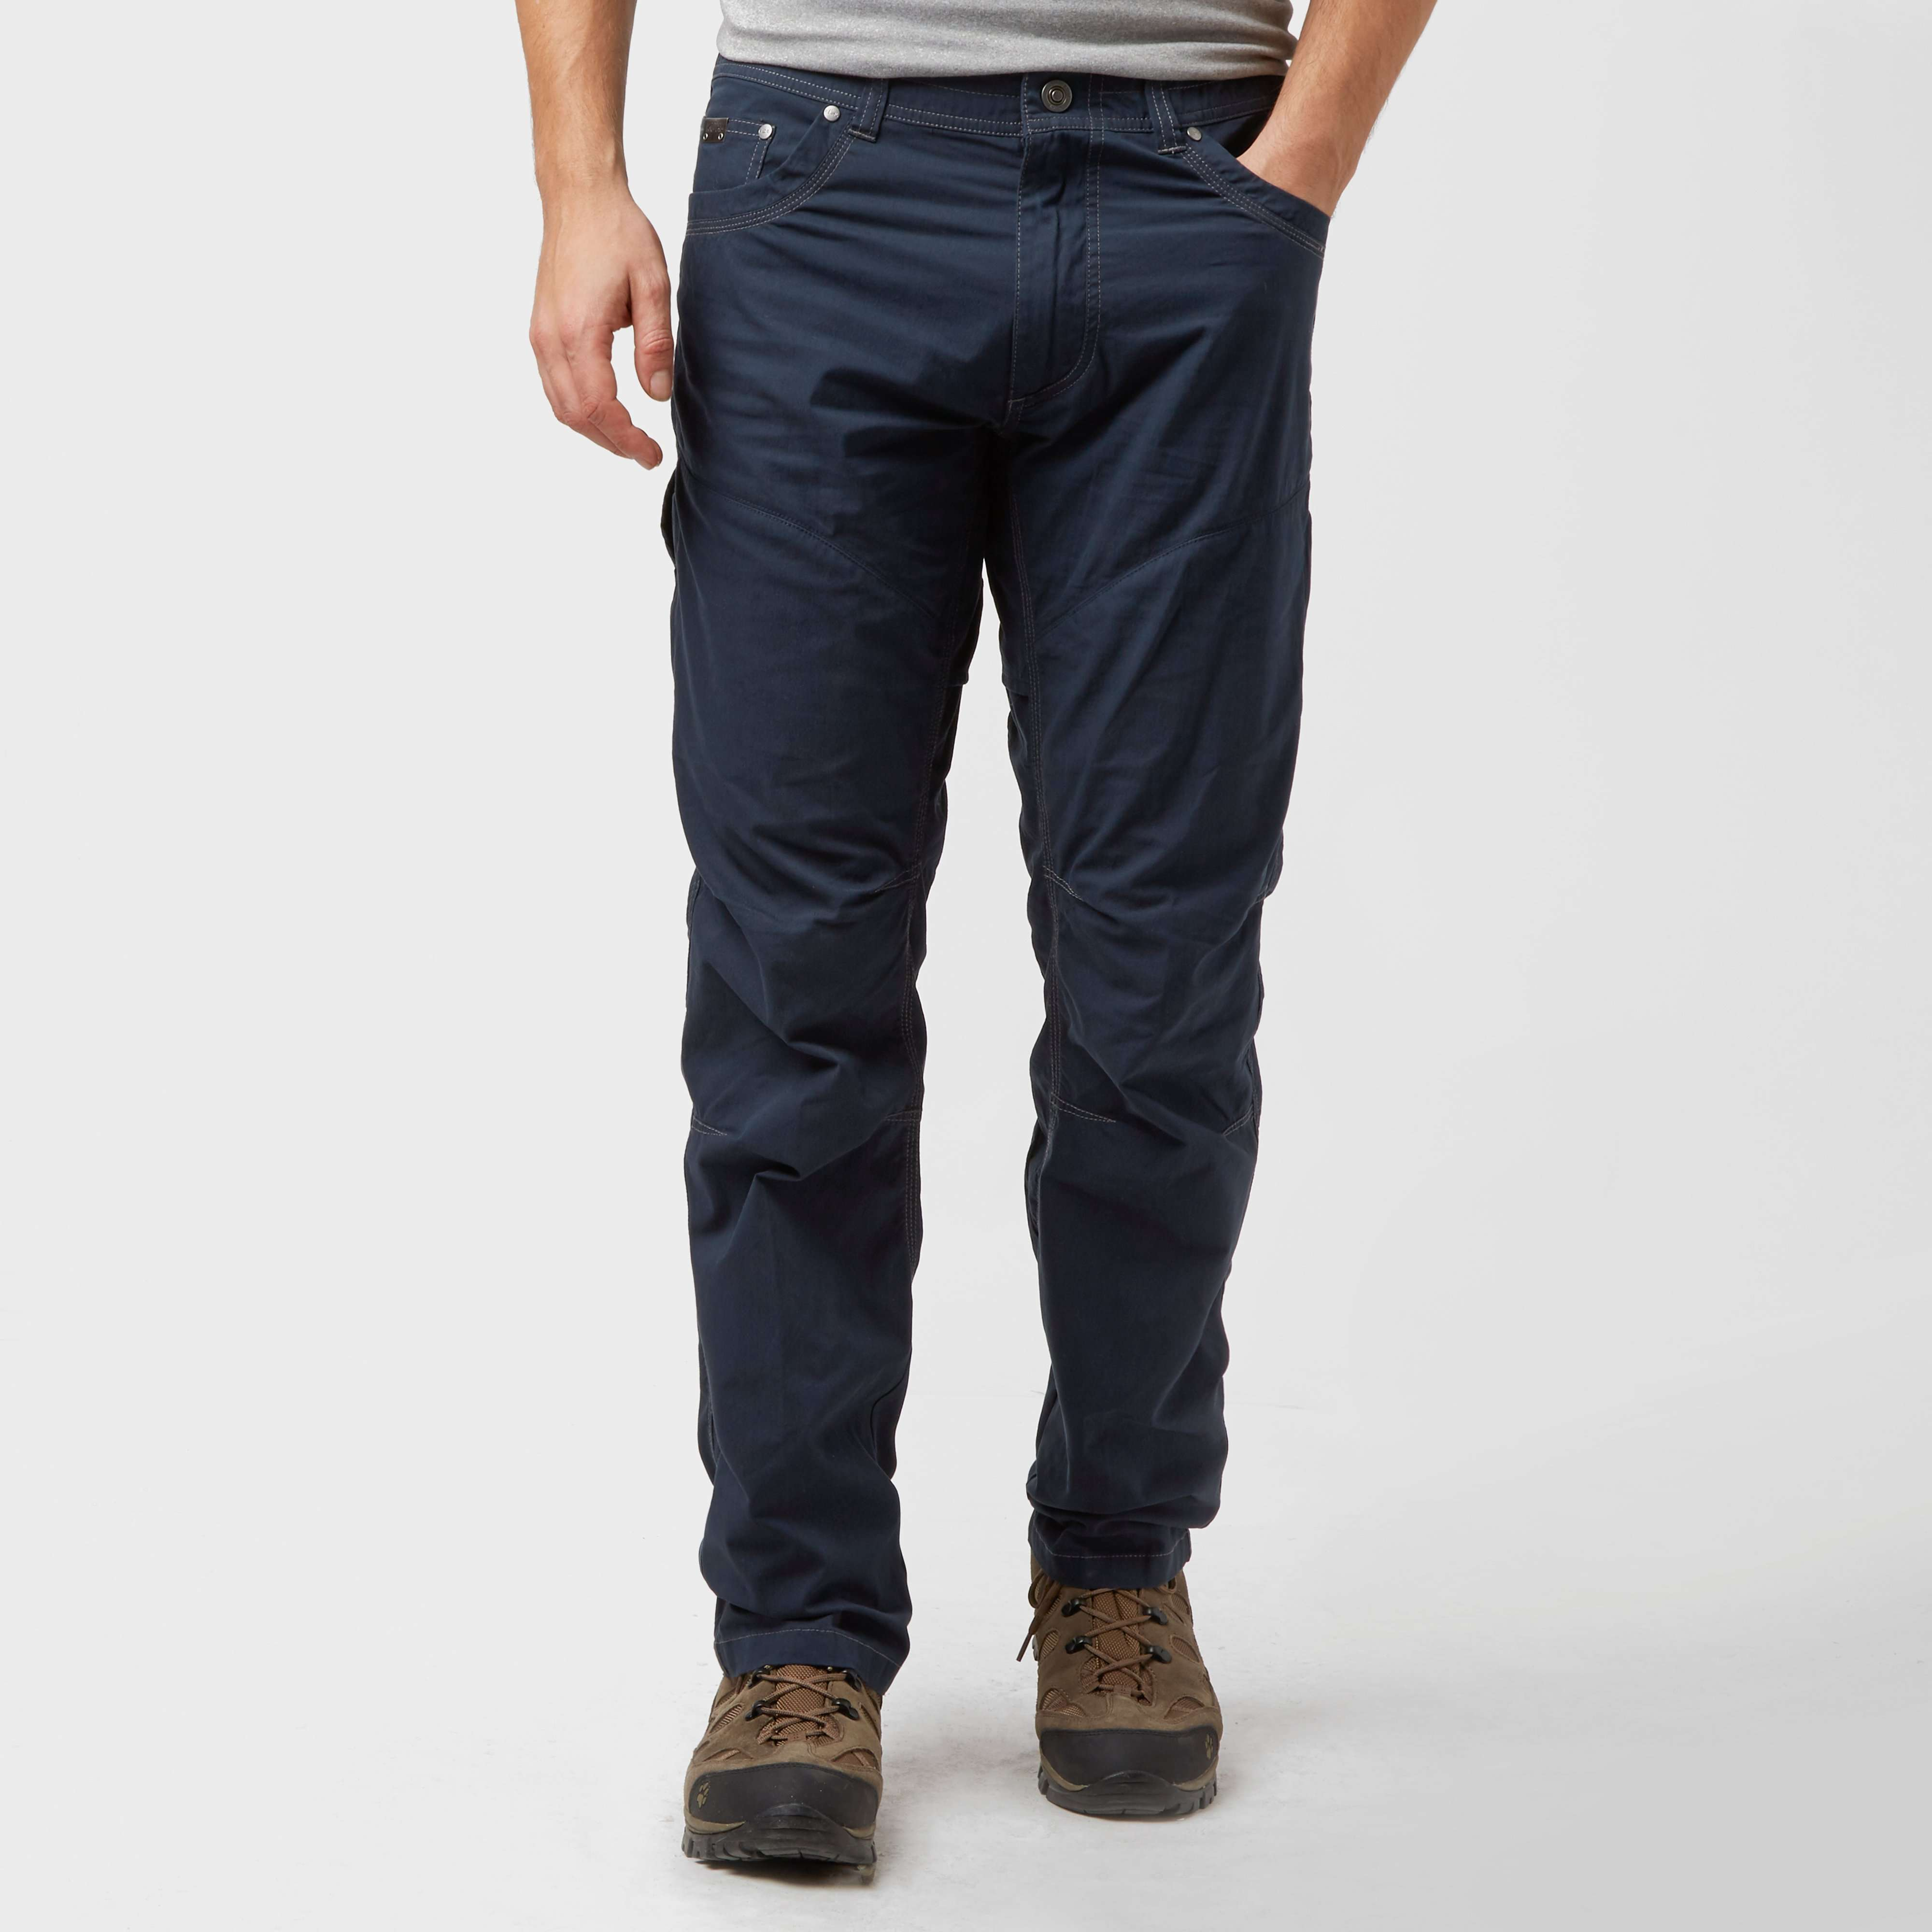 KUHL Men's Konfidant Air™ Pants